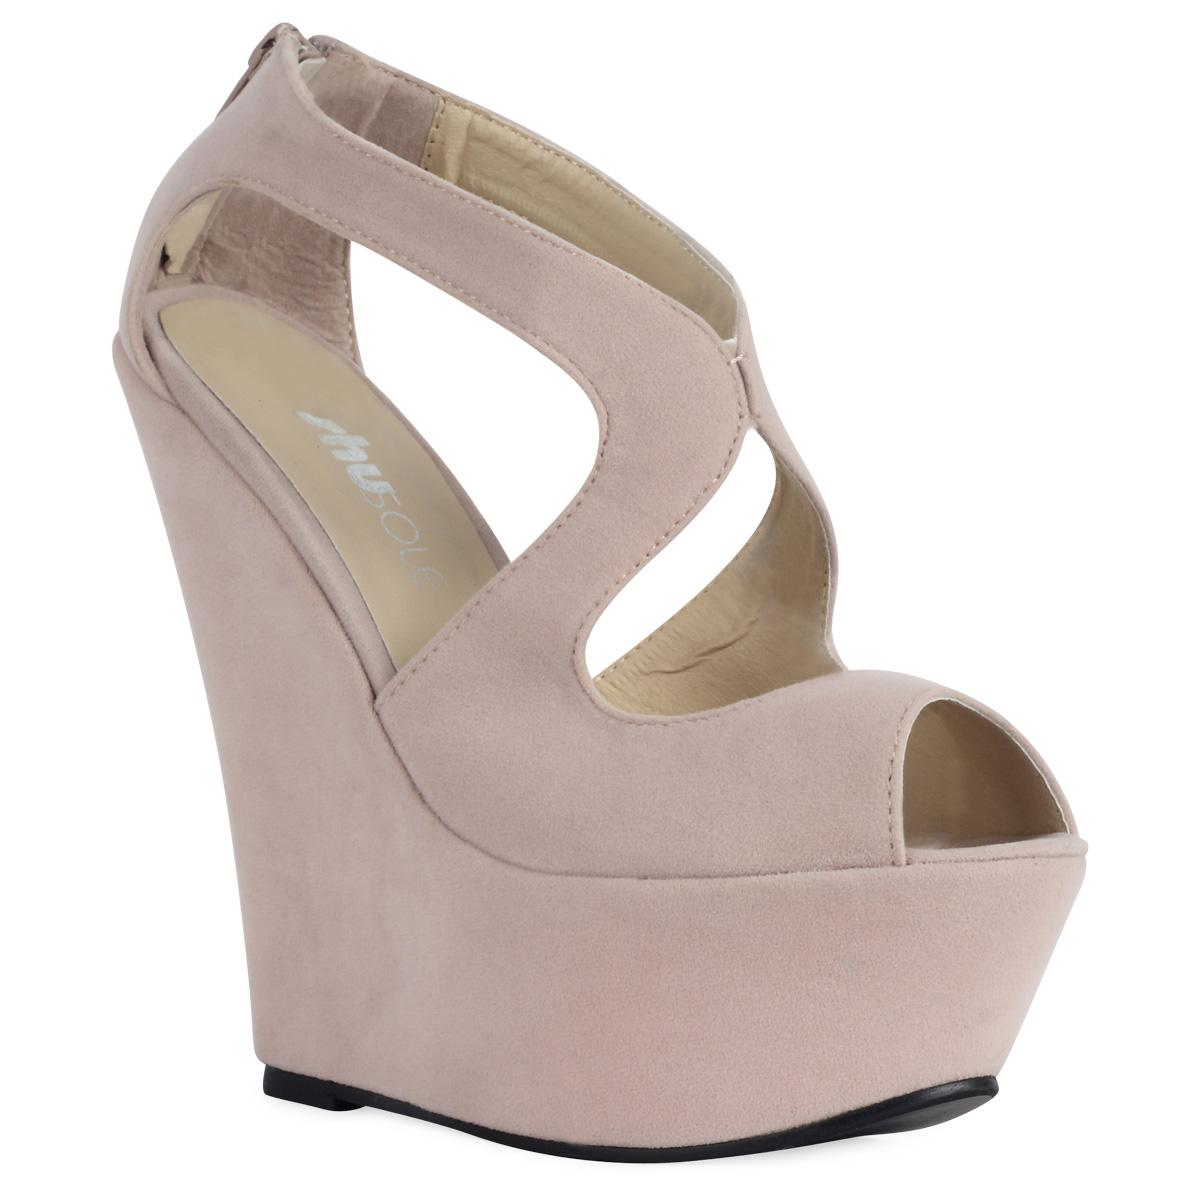 chaussure femme decoupe nude talon haut compense bout ouvert peep toe 36 41 ebay. Black Bedroom Furniture Sets. Home Design Ideas